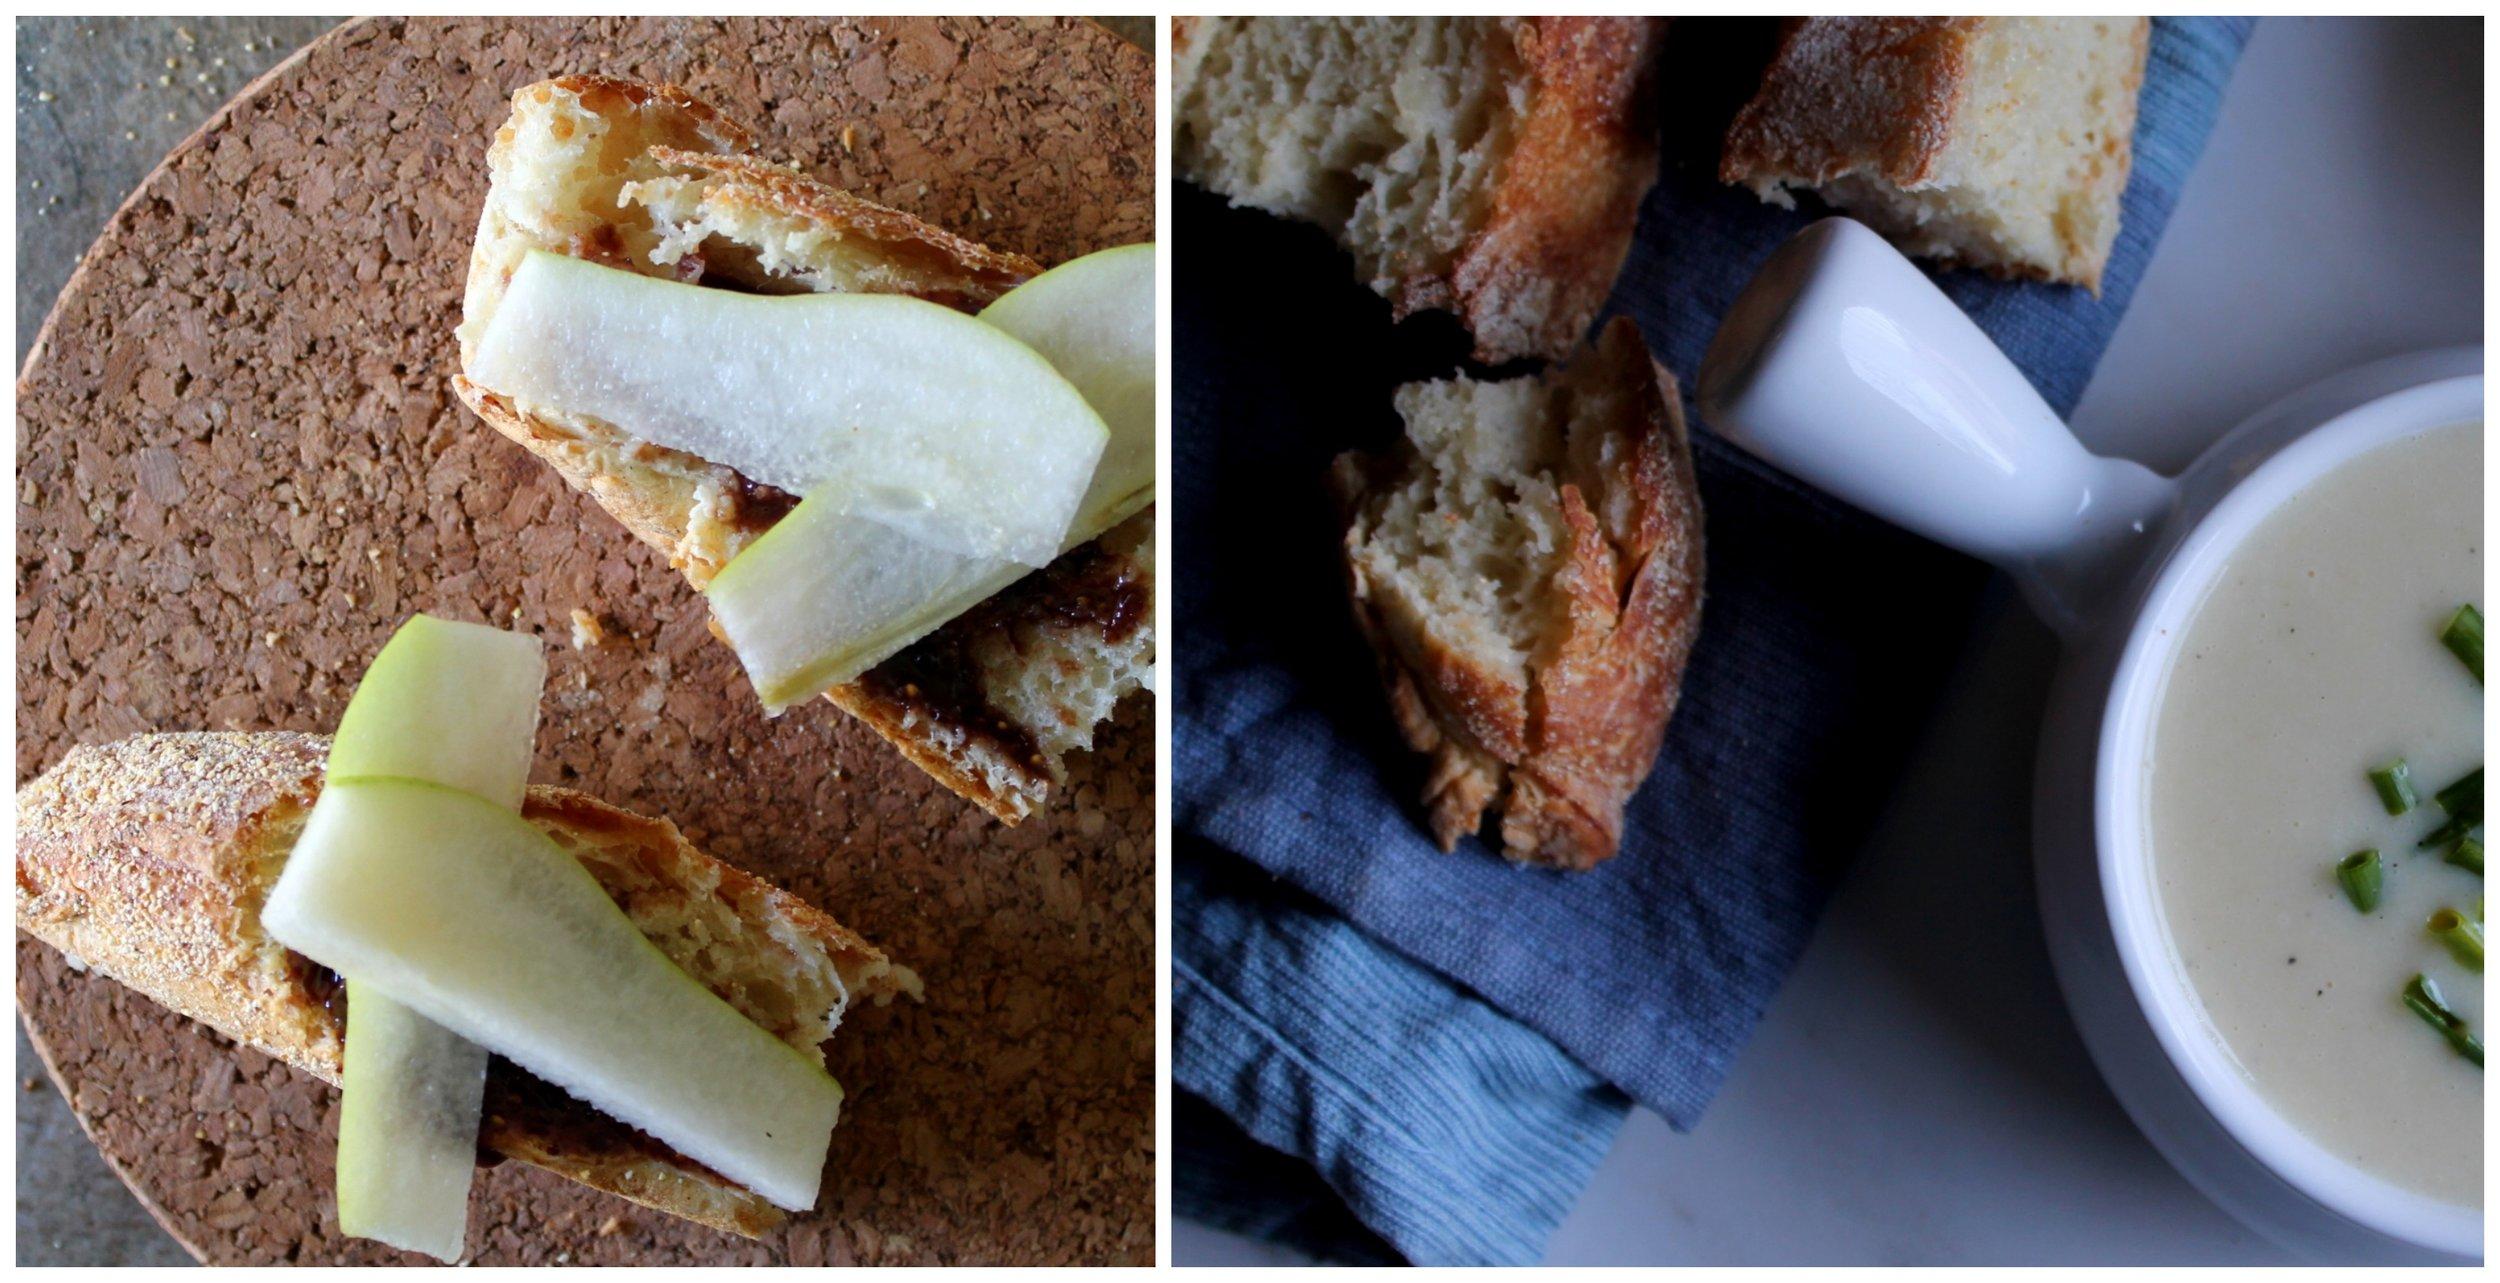 Mark Bittman's No Knead Bread